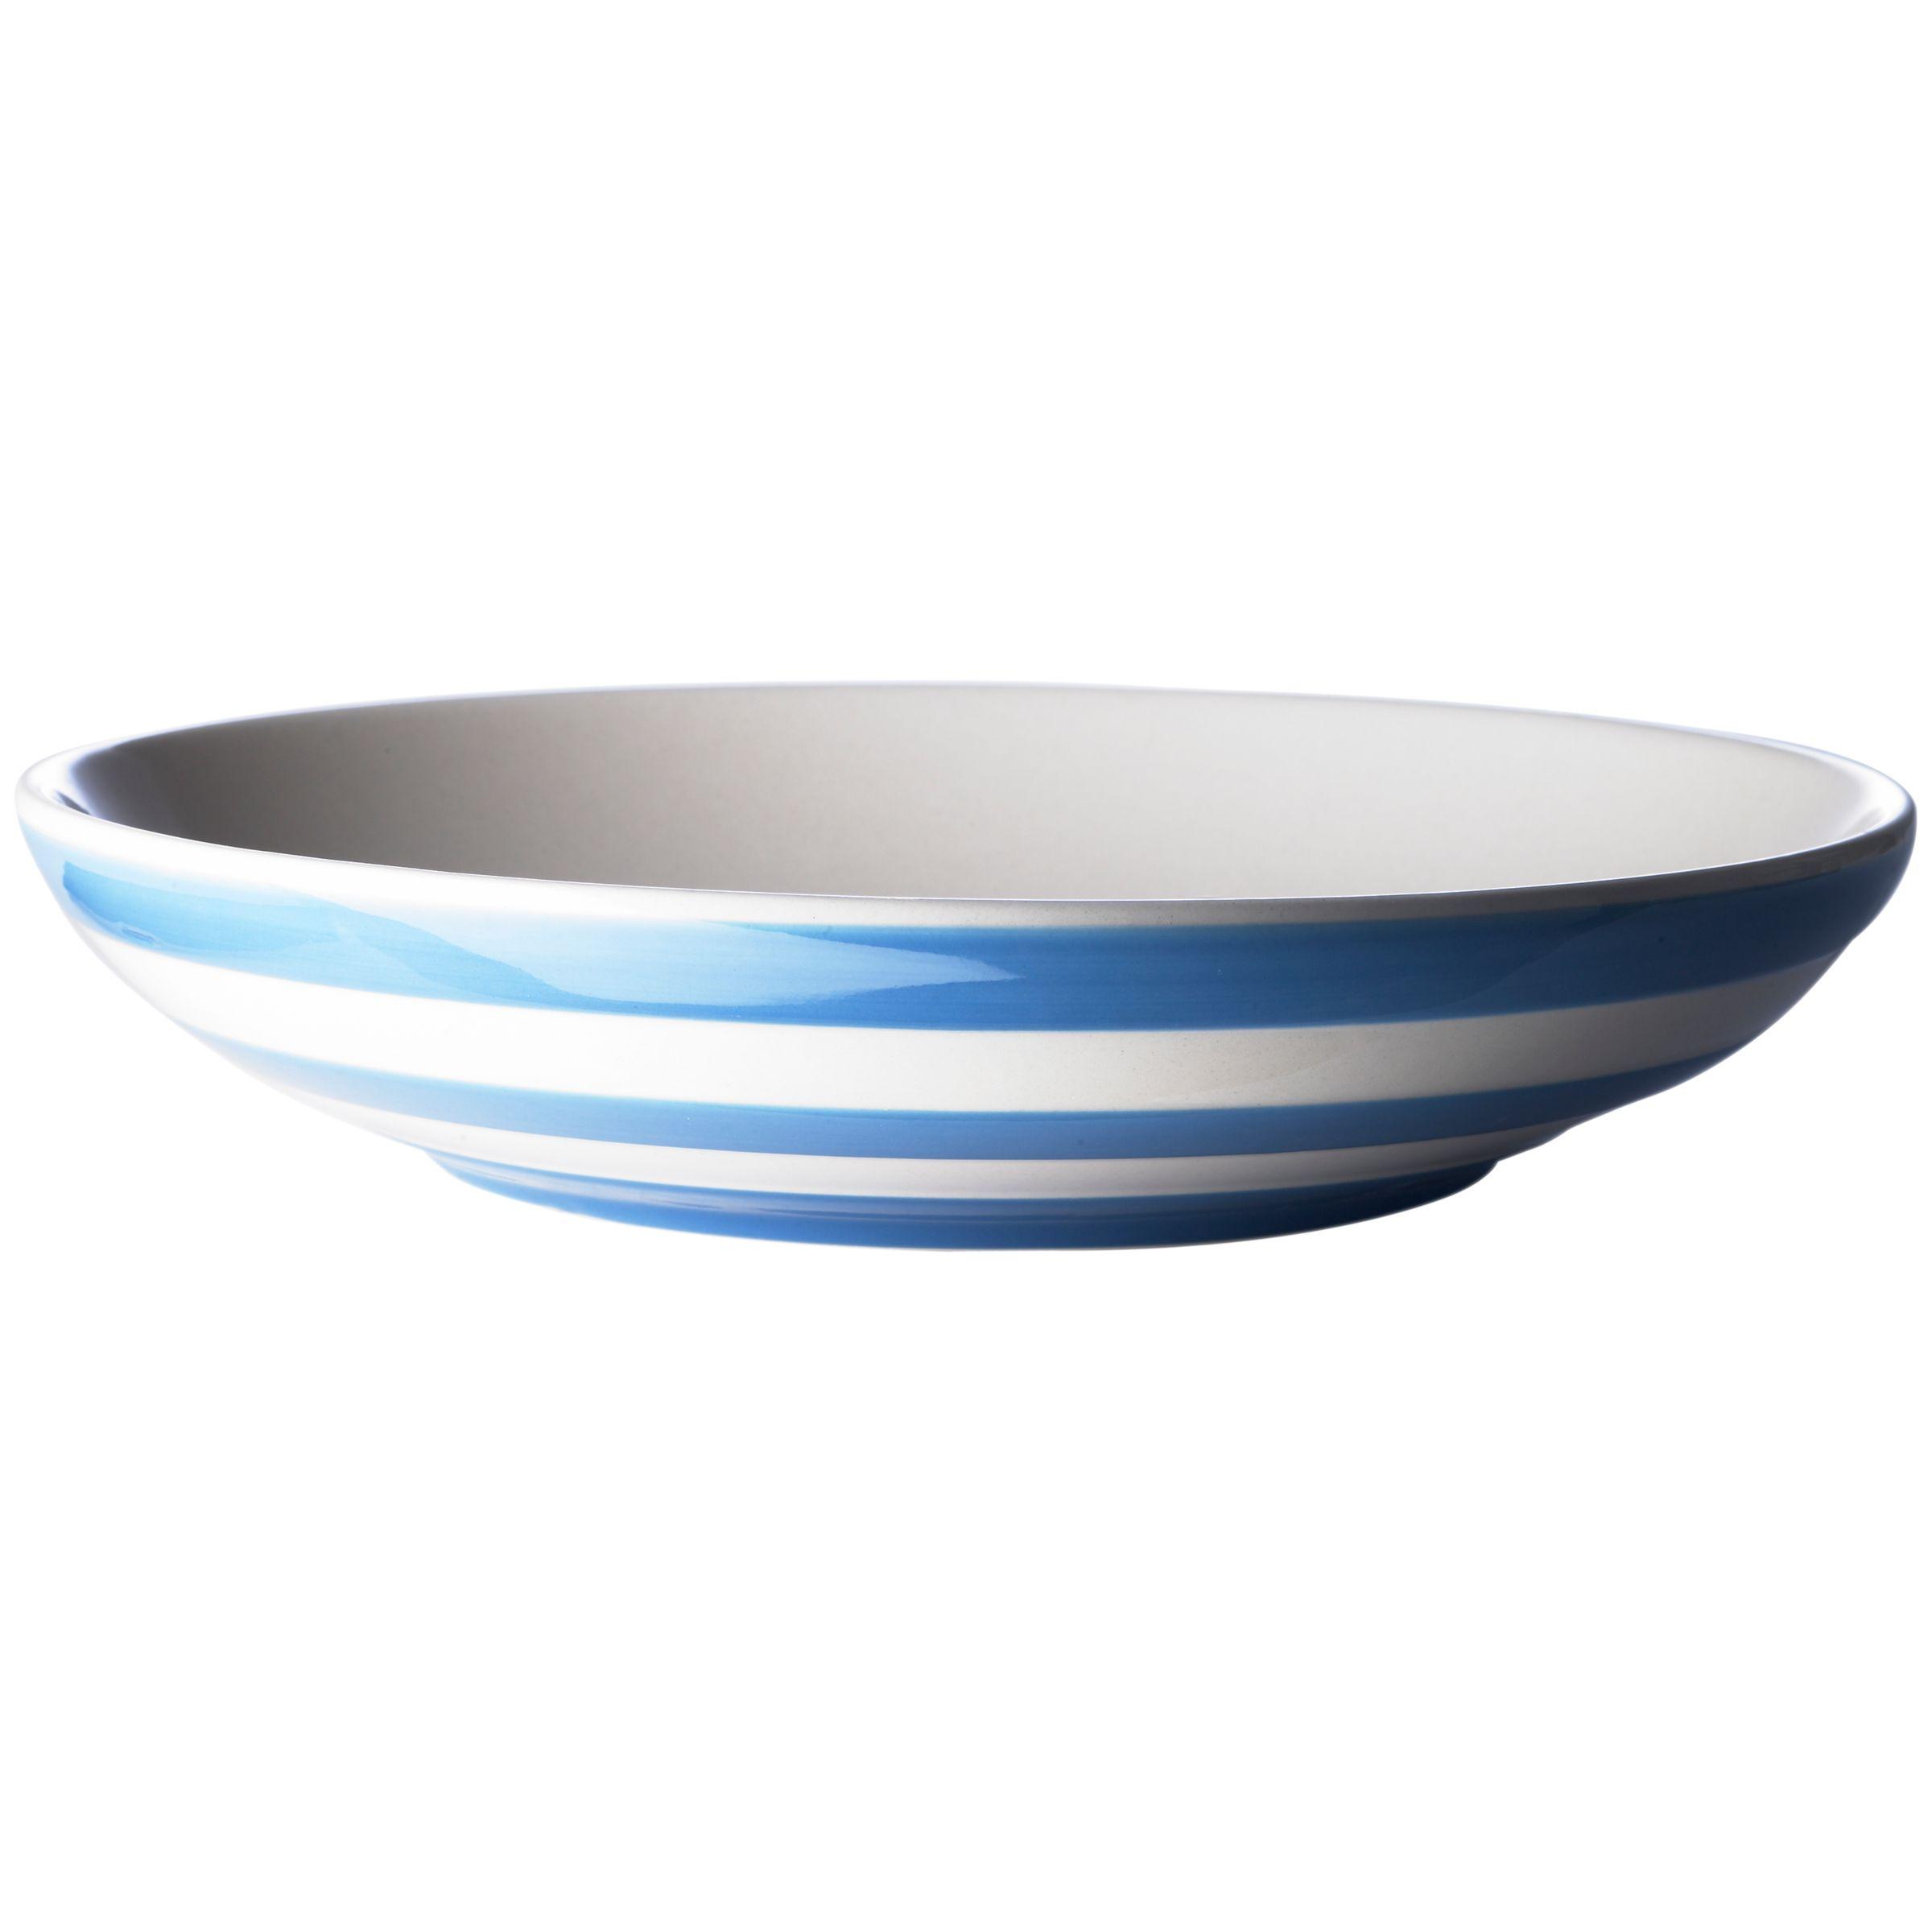 Cornishware Cornishware Pasta Bowl